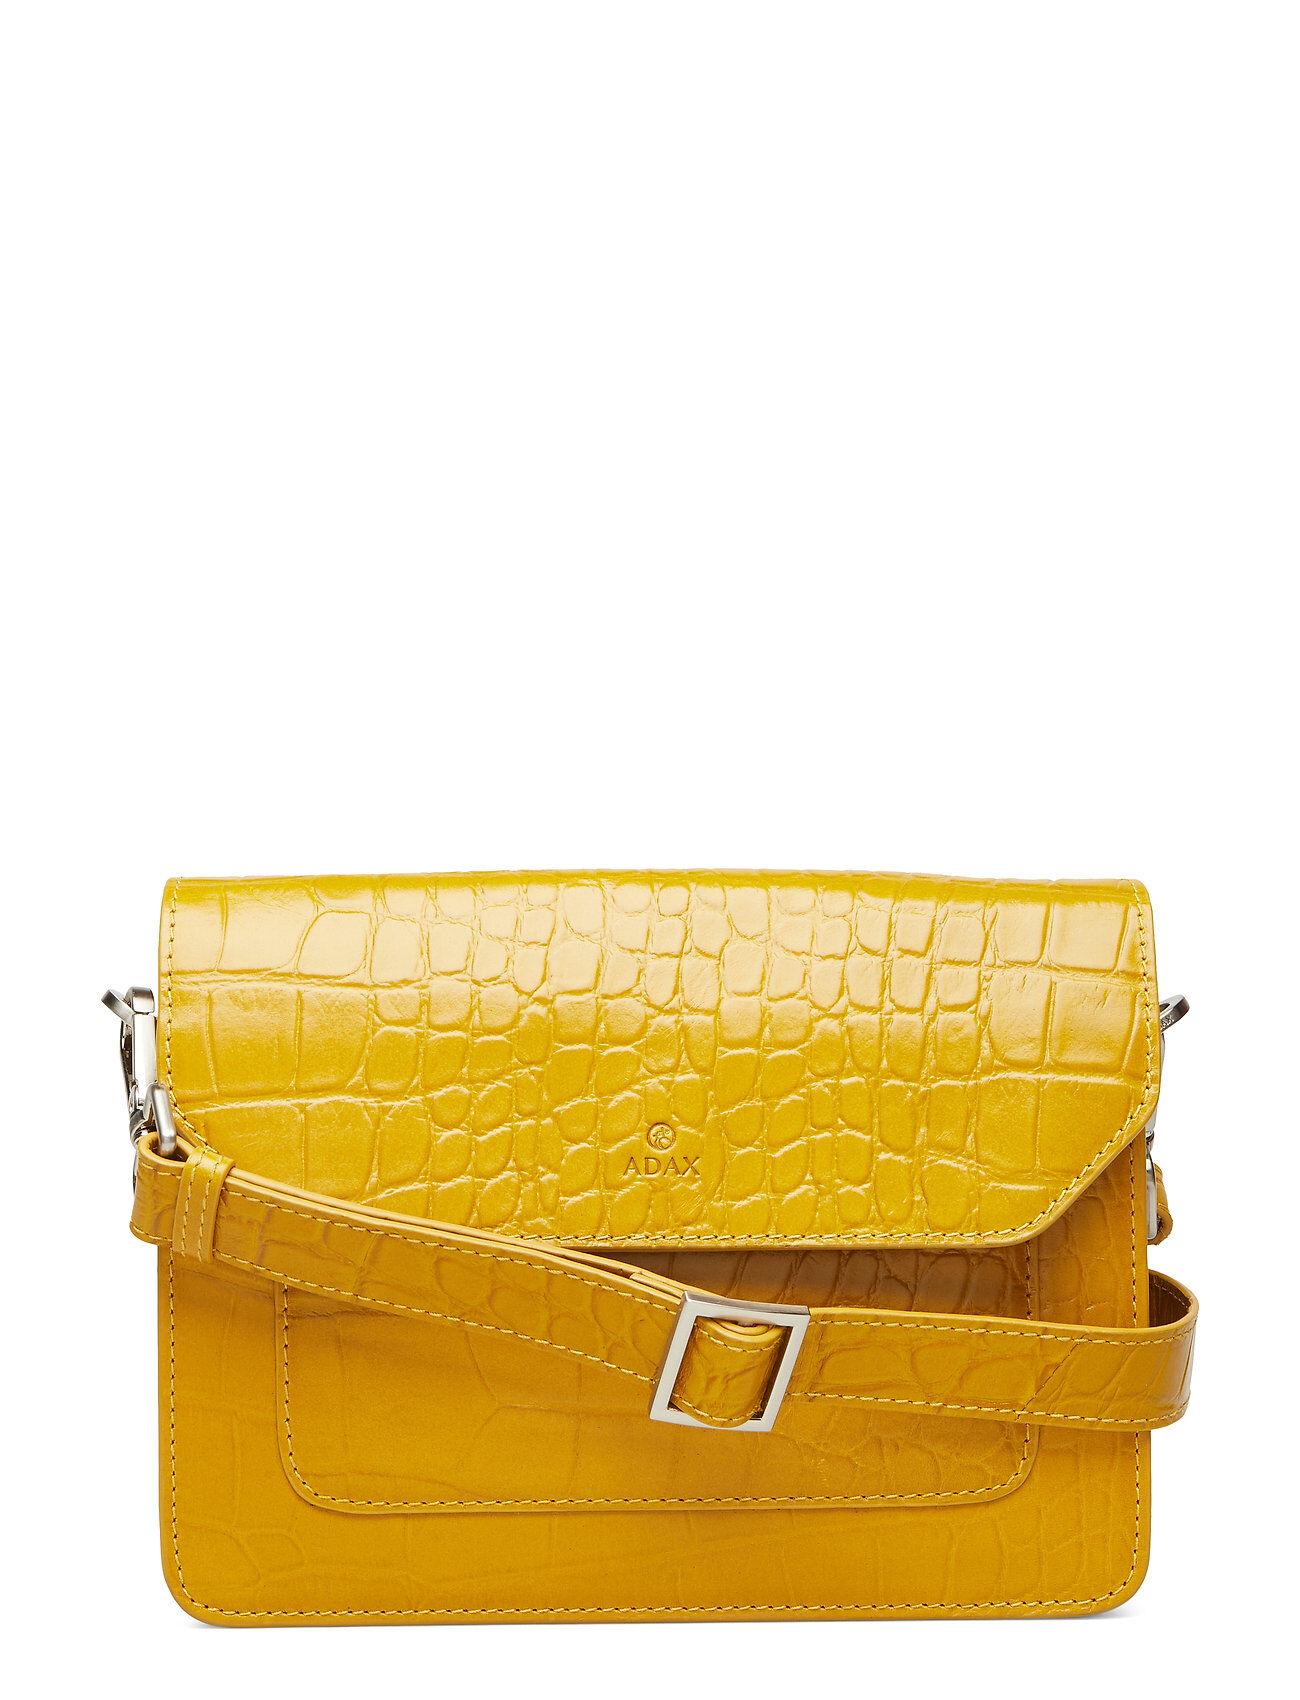 Adax Teramo Shoulder Bag India Bags Small Shoulder Bags - Crossbody Bags Keltainen Adax